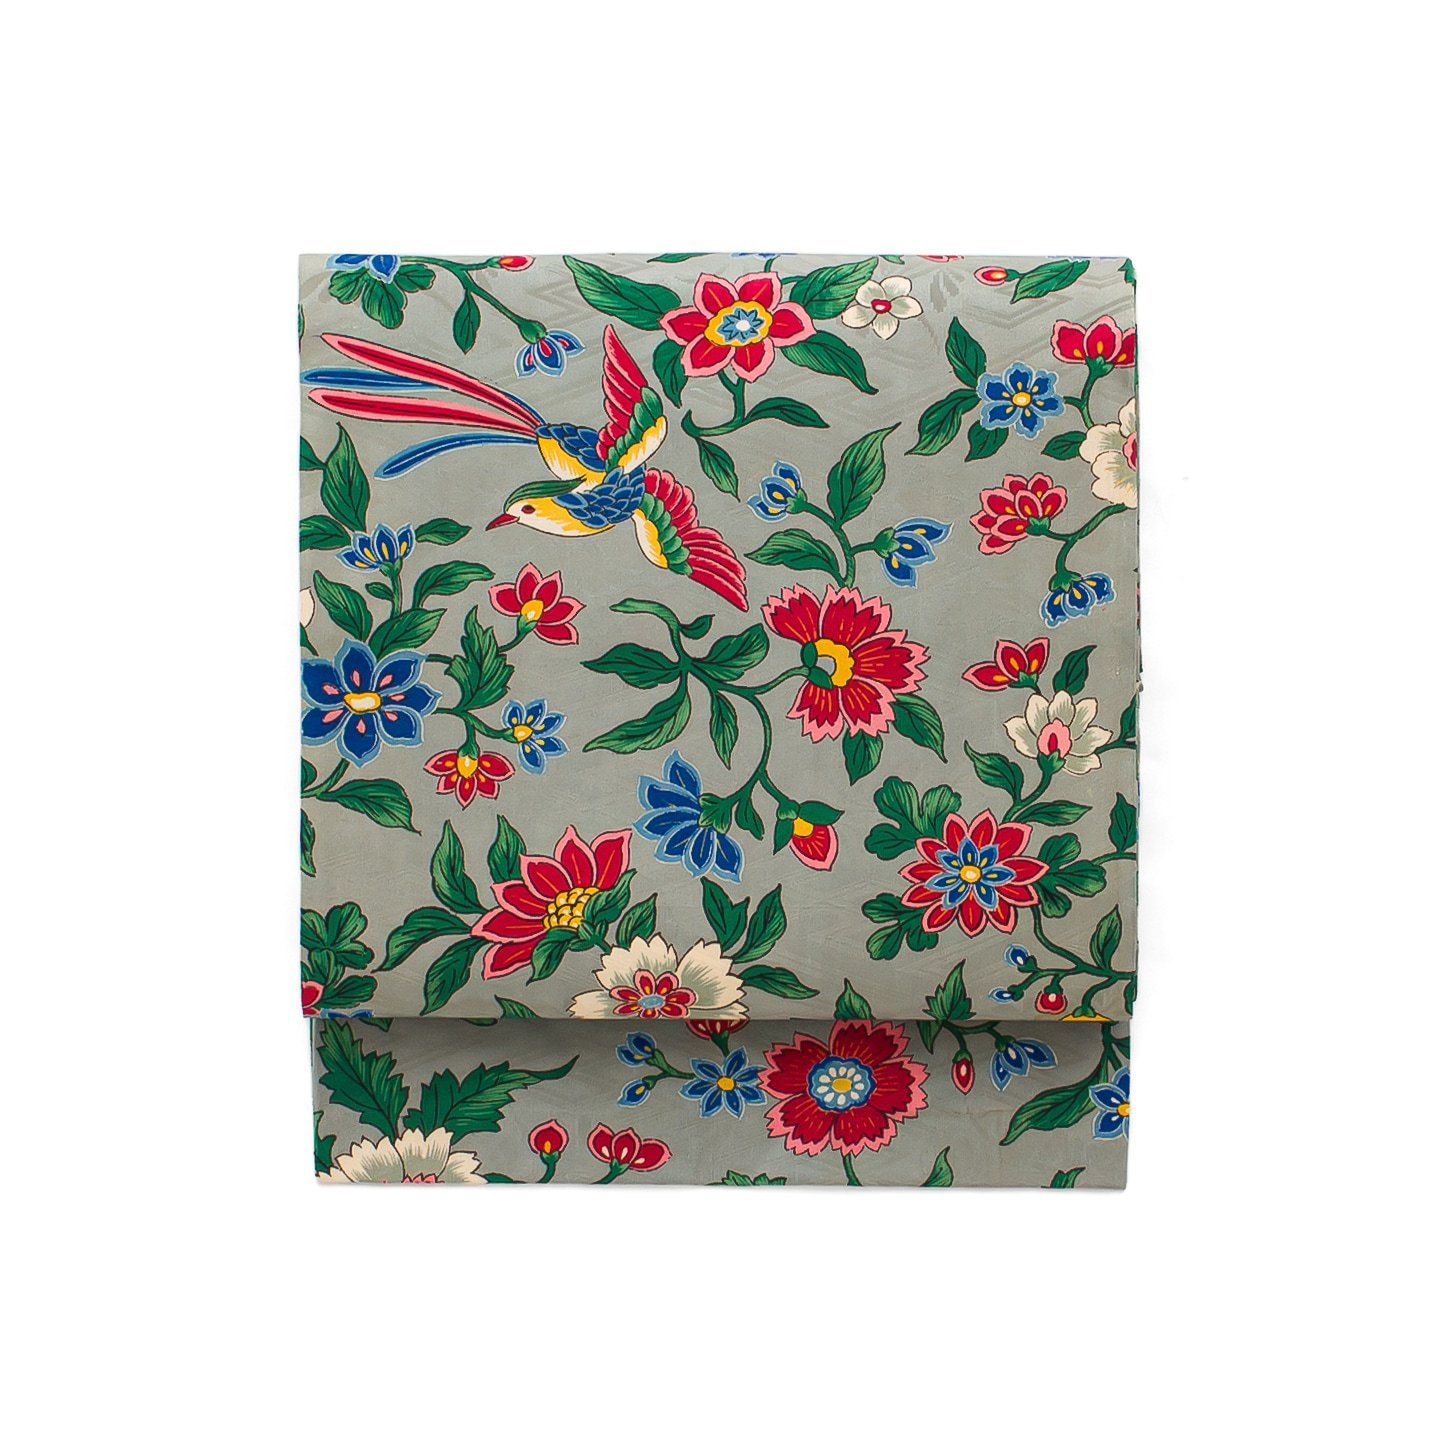 「kaico 唐花に極楽鳥」の商品画像